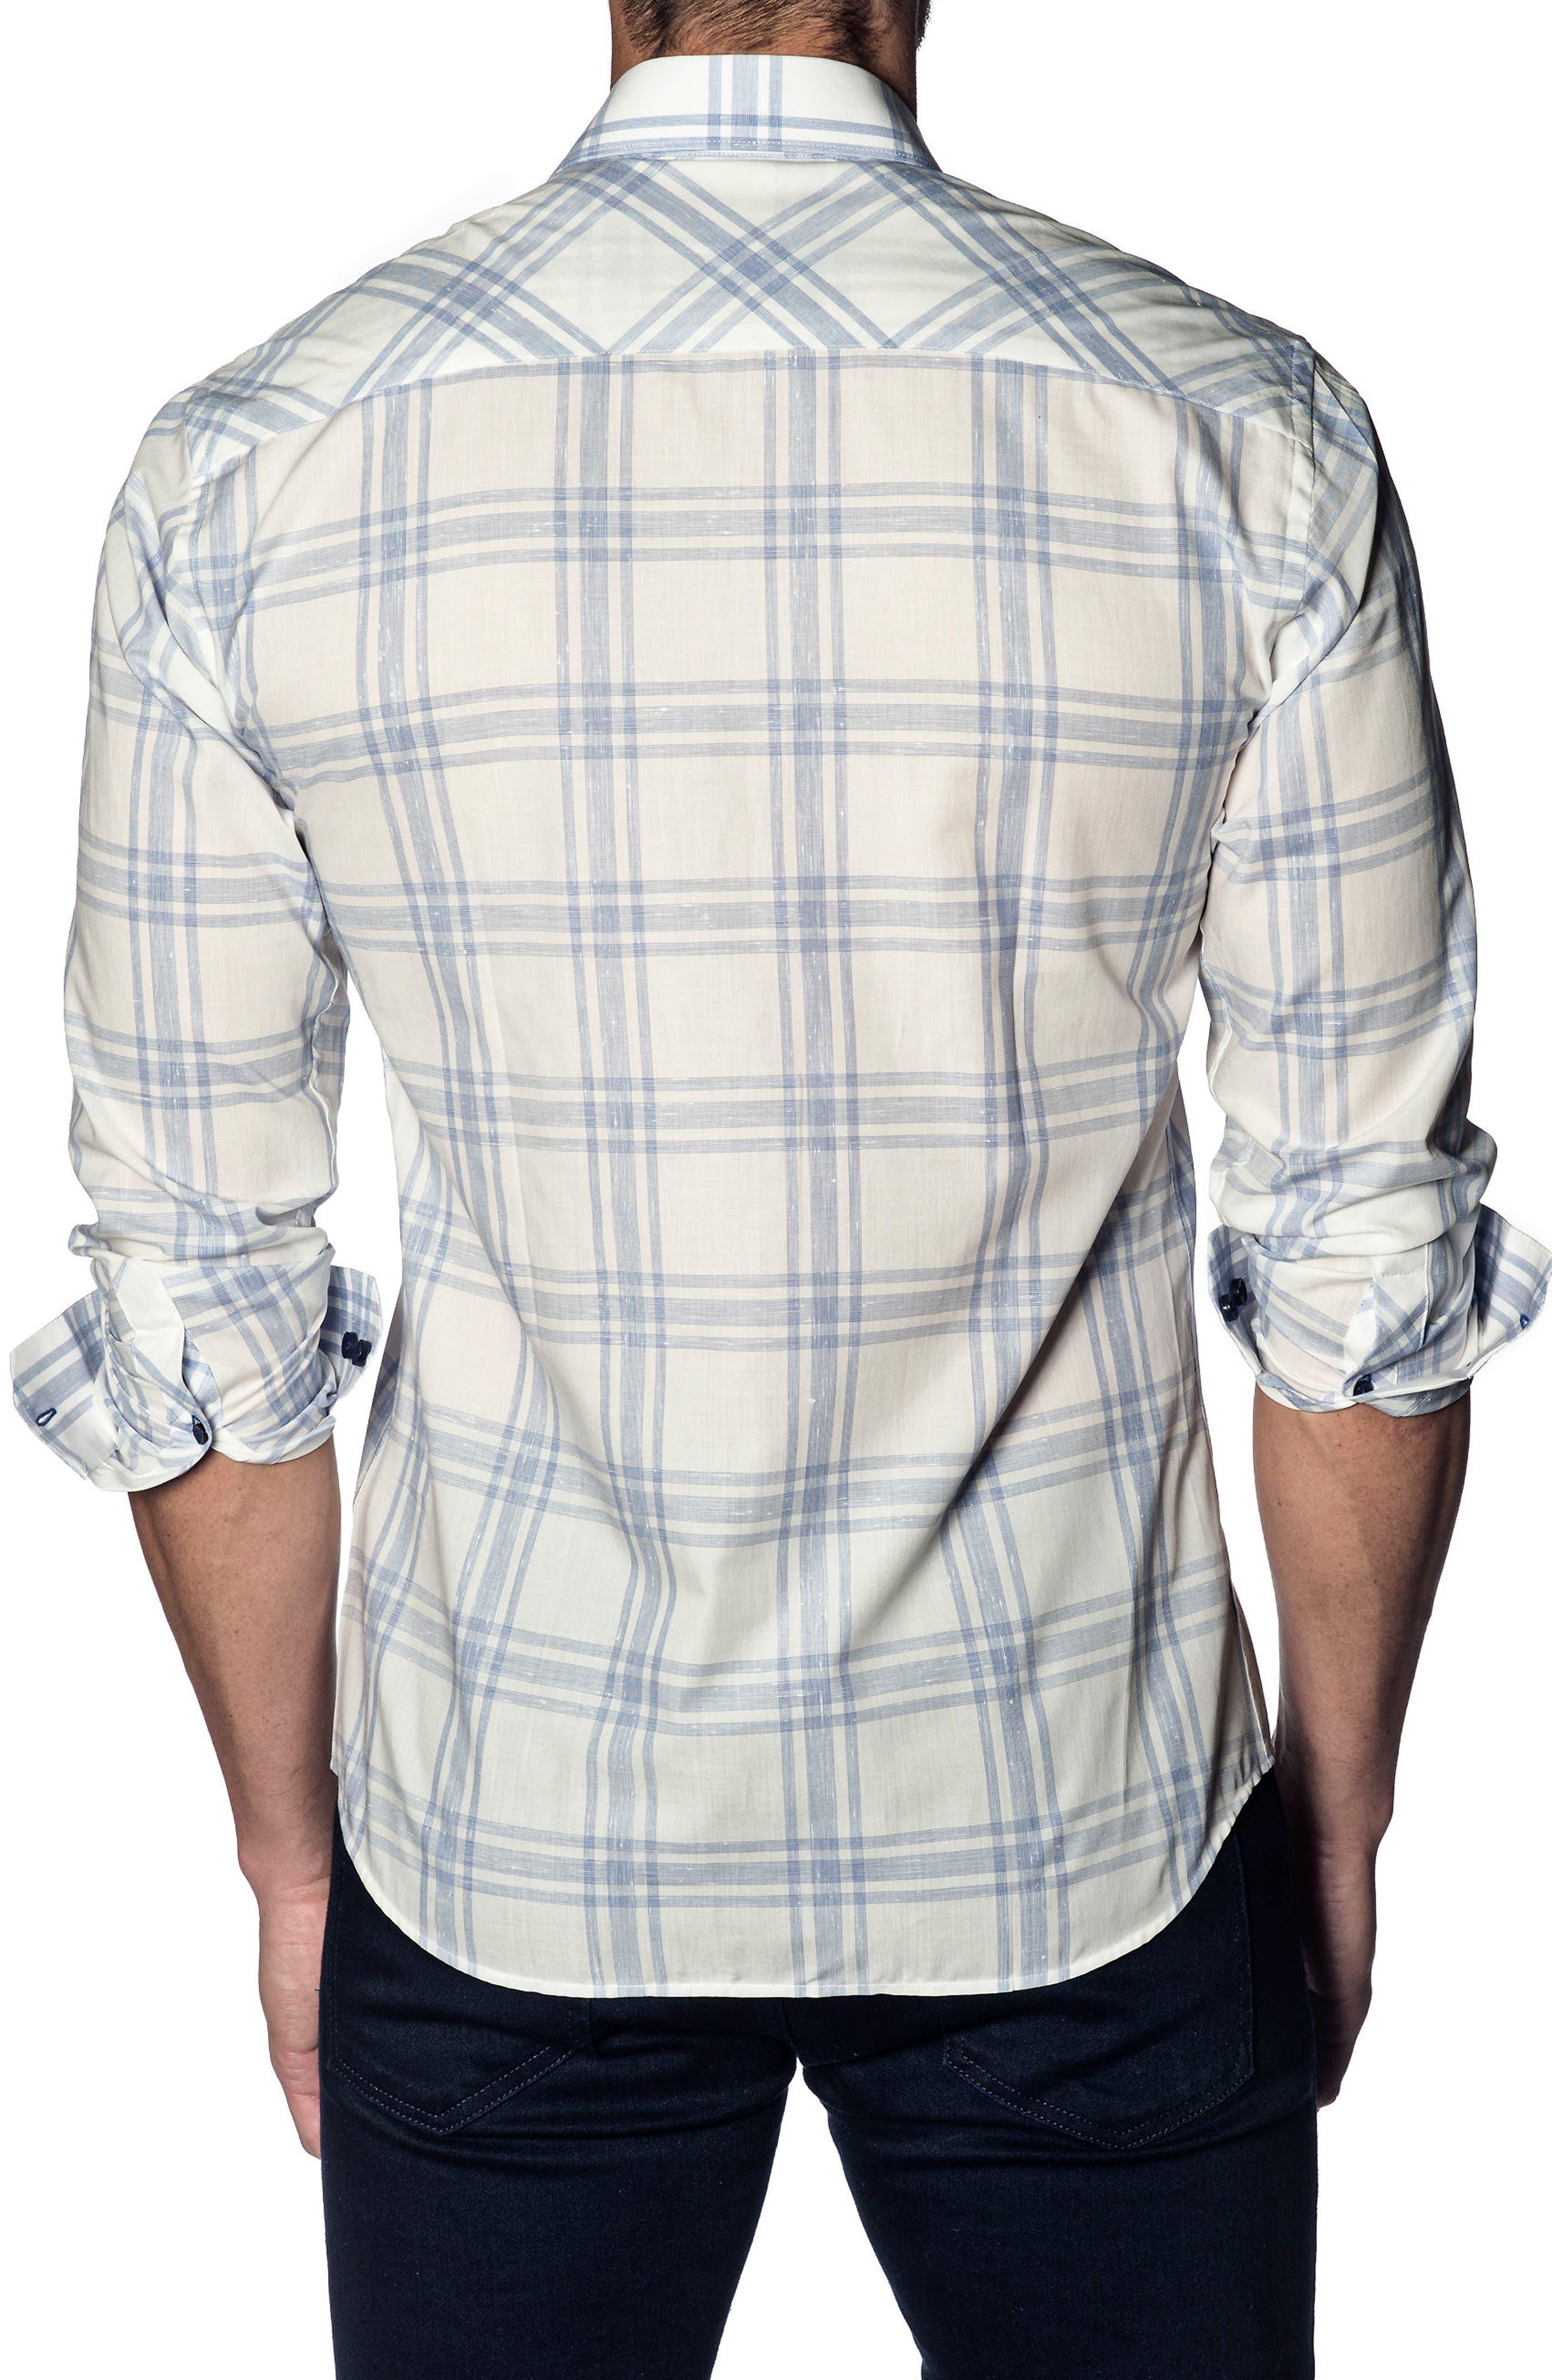 Trim Fit Plaid Sport Shirt,                             Alternate thumbnail 2, color,                             White - Blue Red Stripe